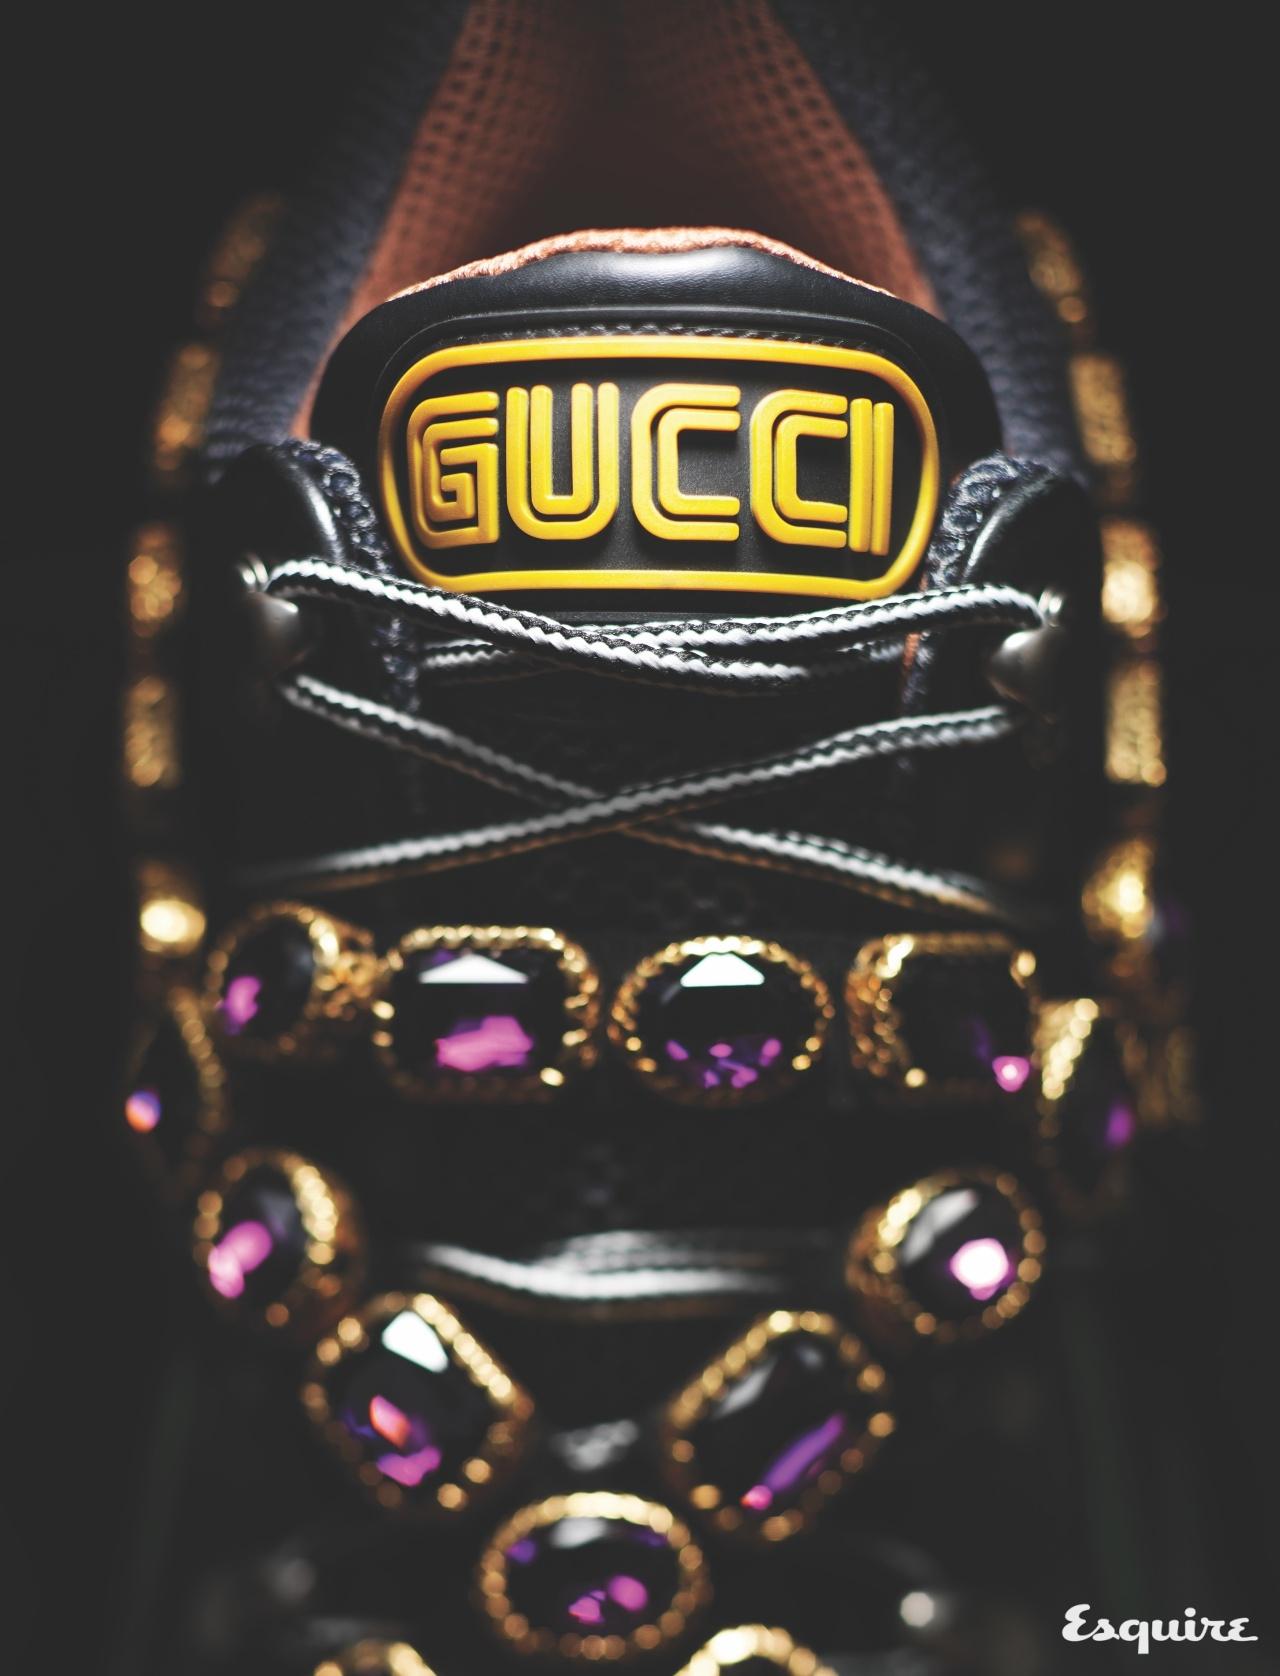 GUCCI 육중한 운동화에 크리스털 장식을 둘렀다. 더 흥미로운 건 세가(SEGA) 폰트를 적용한 특별한 로고. 189만원 구찌.